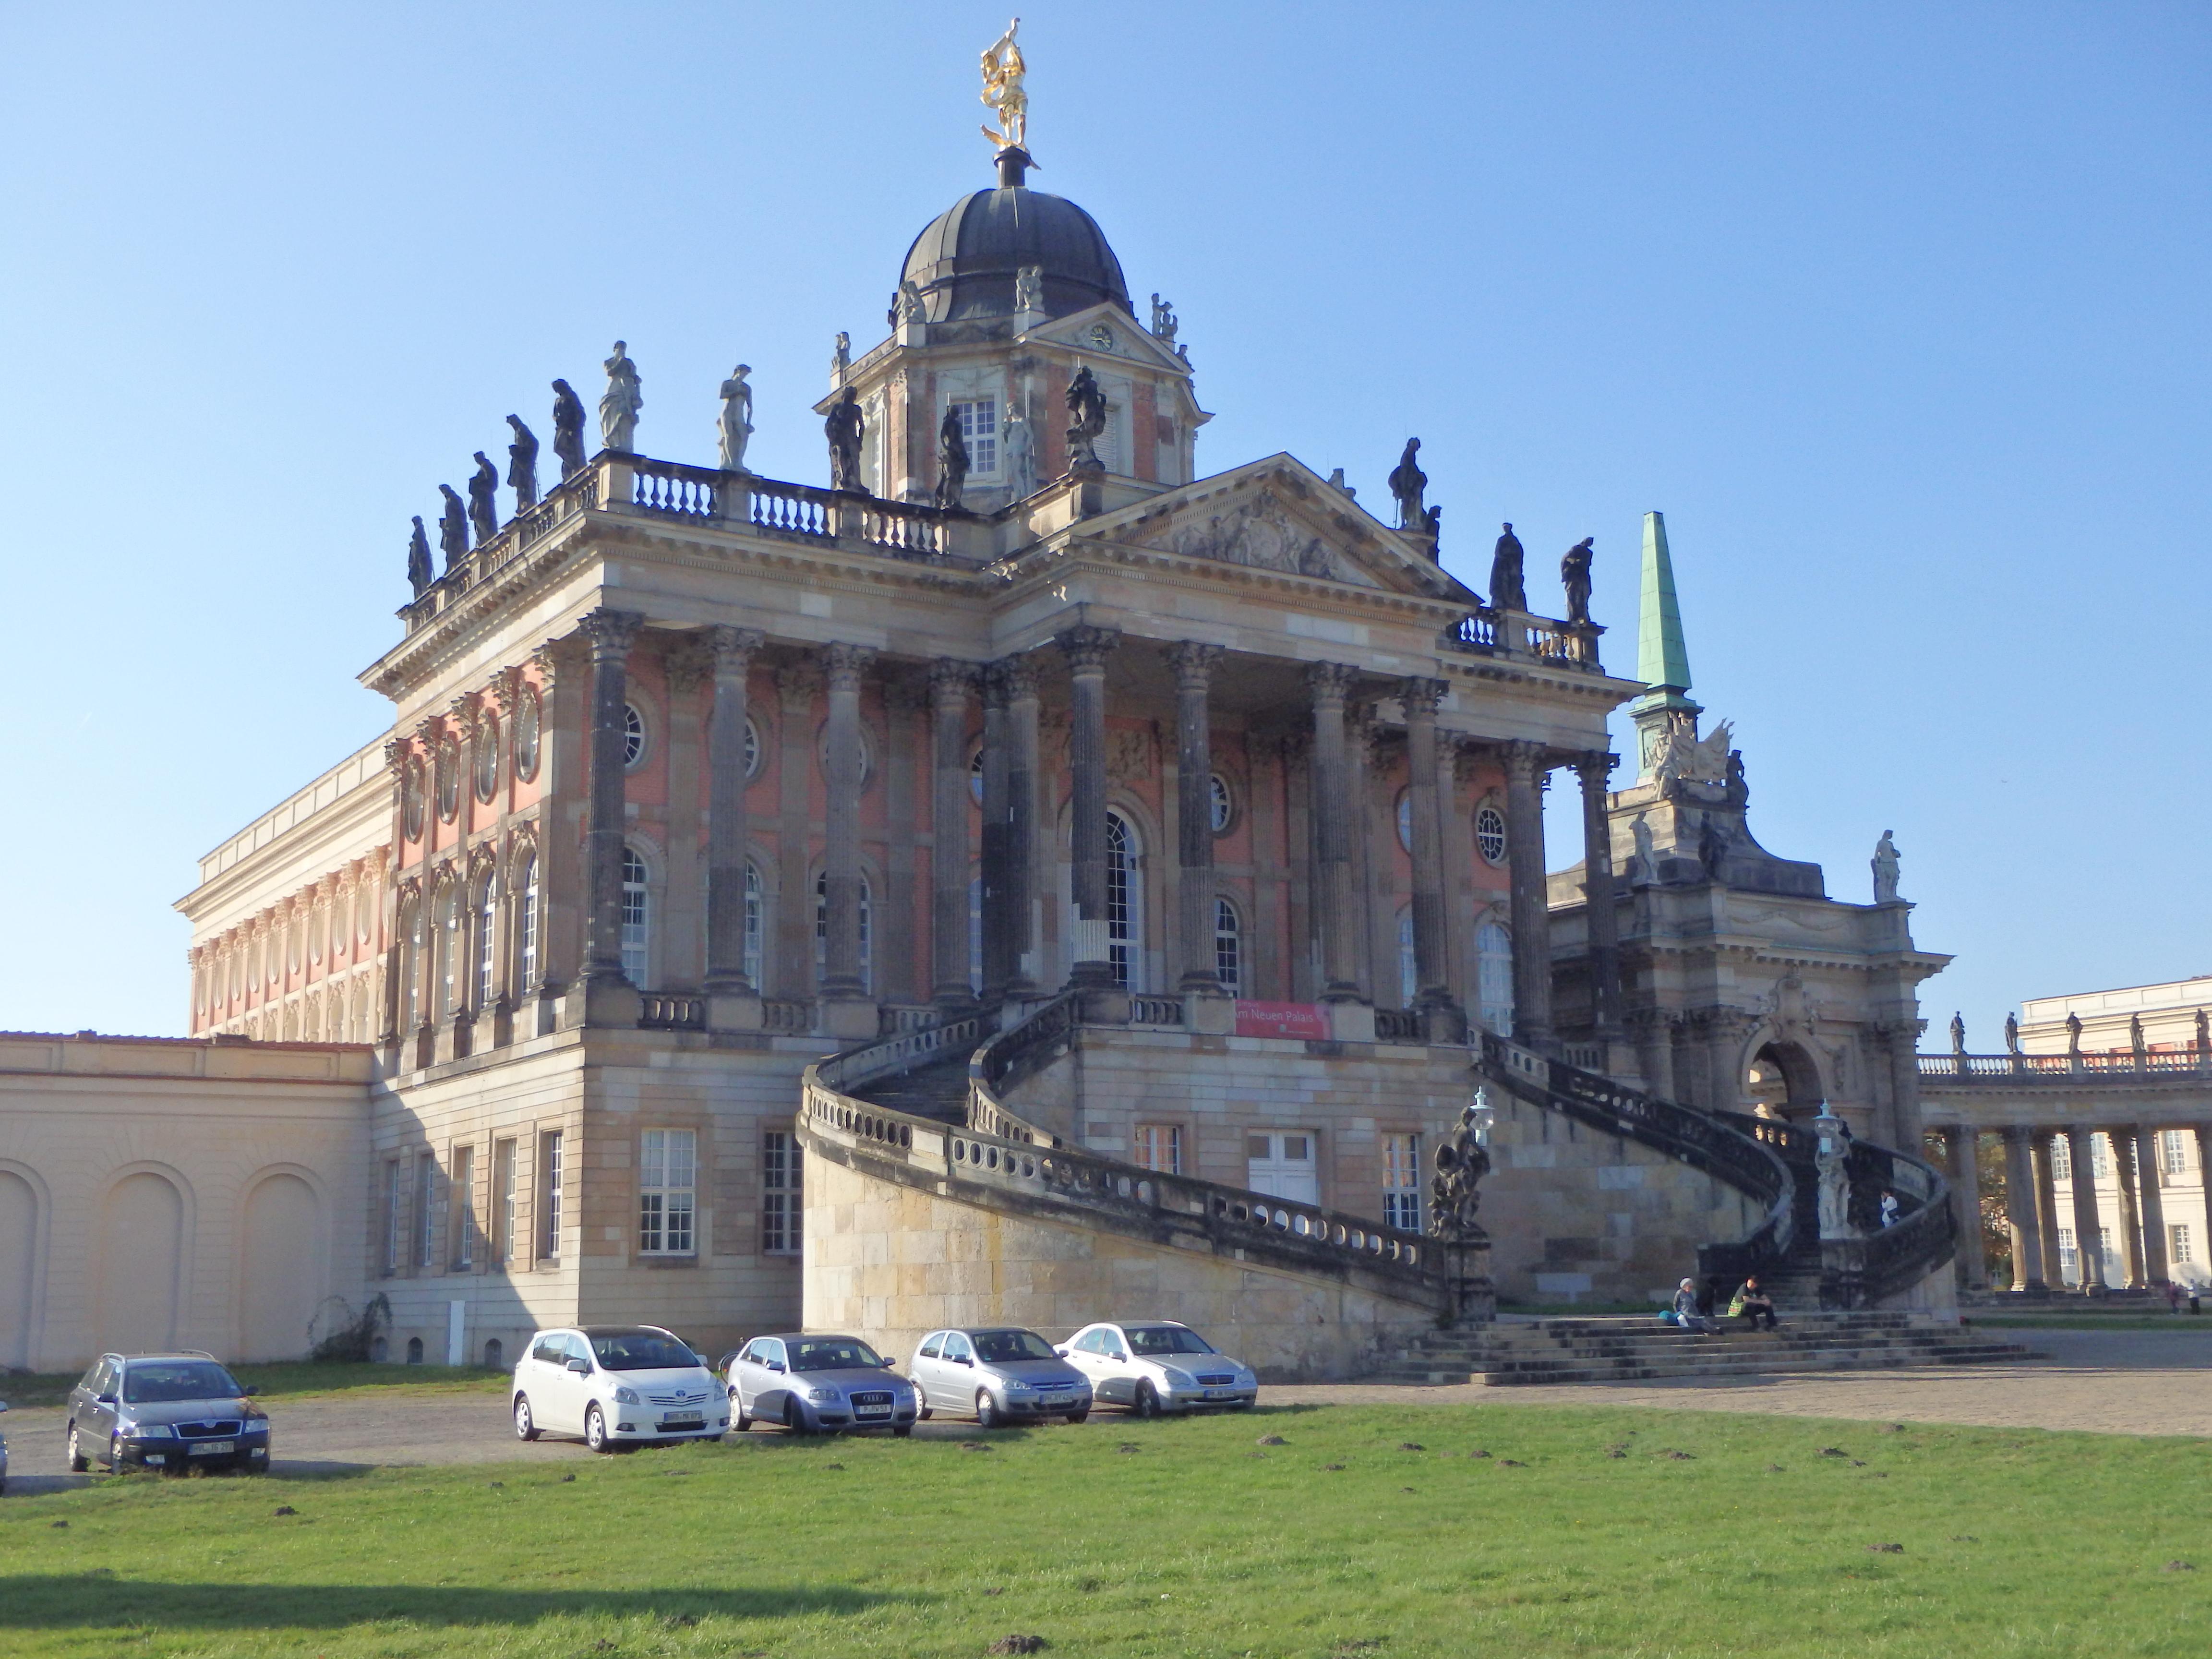 Neues Palais Uni Potsdam